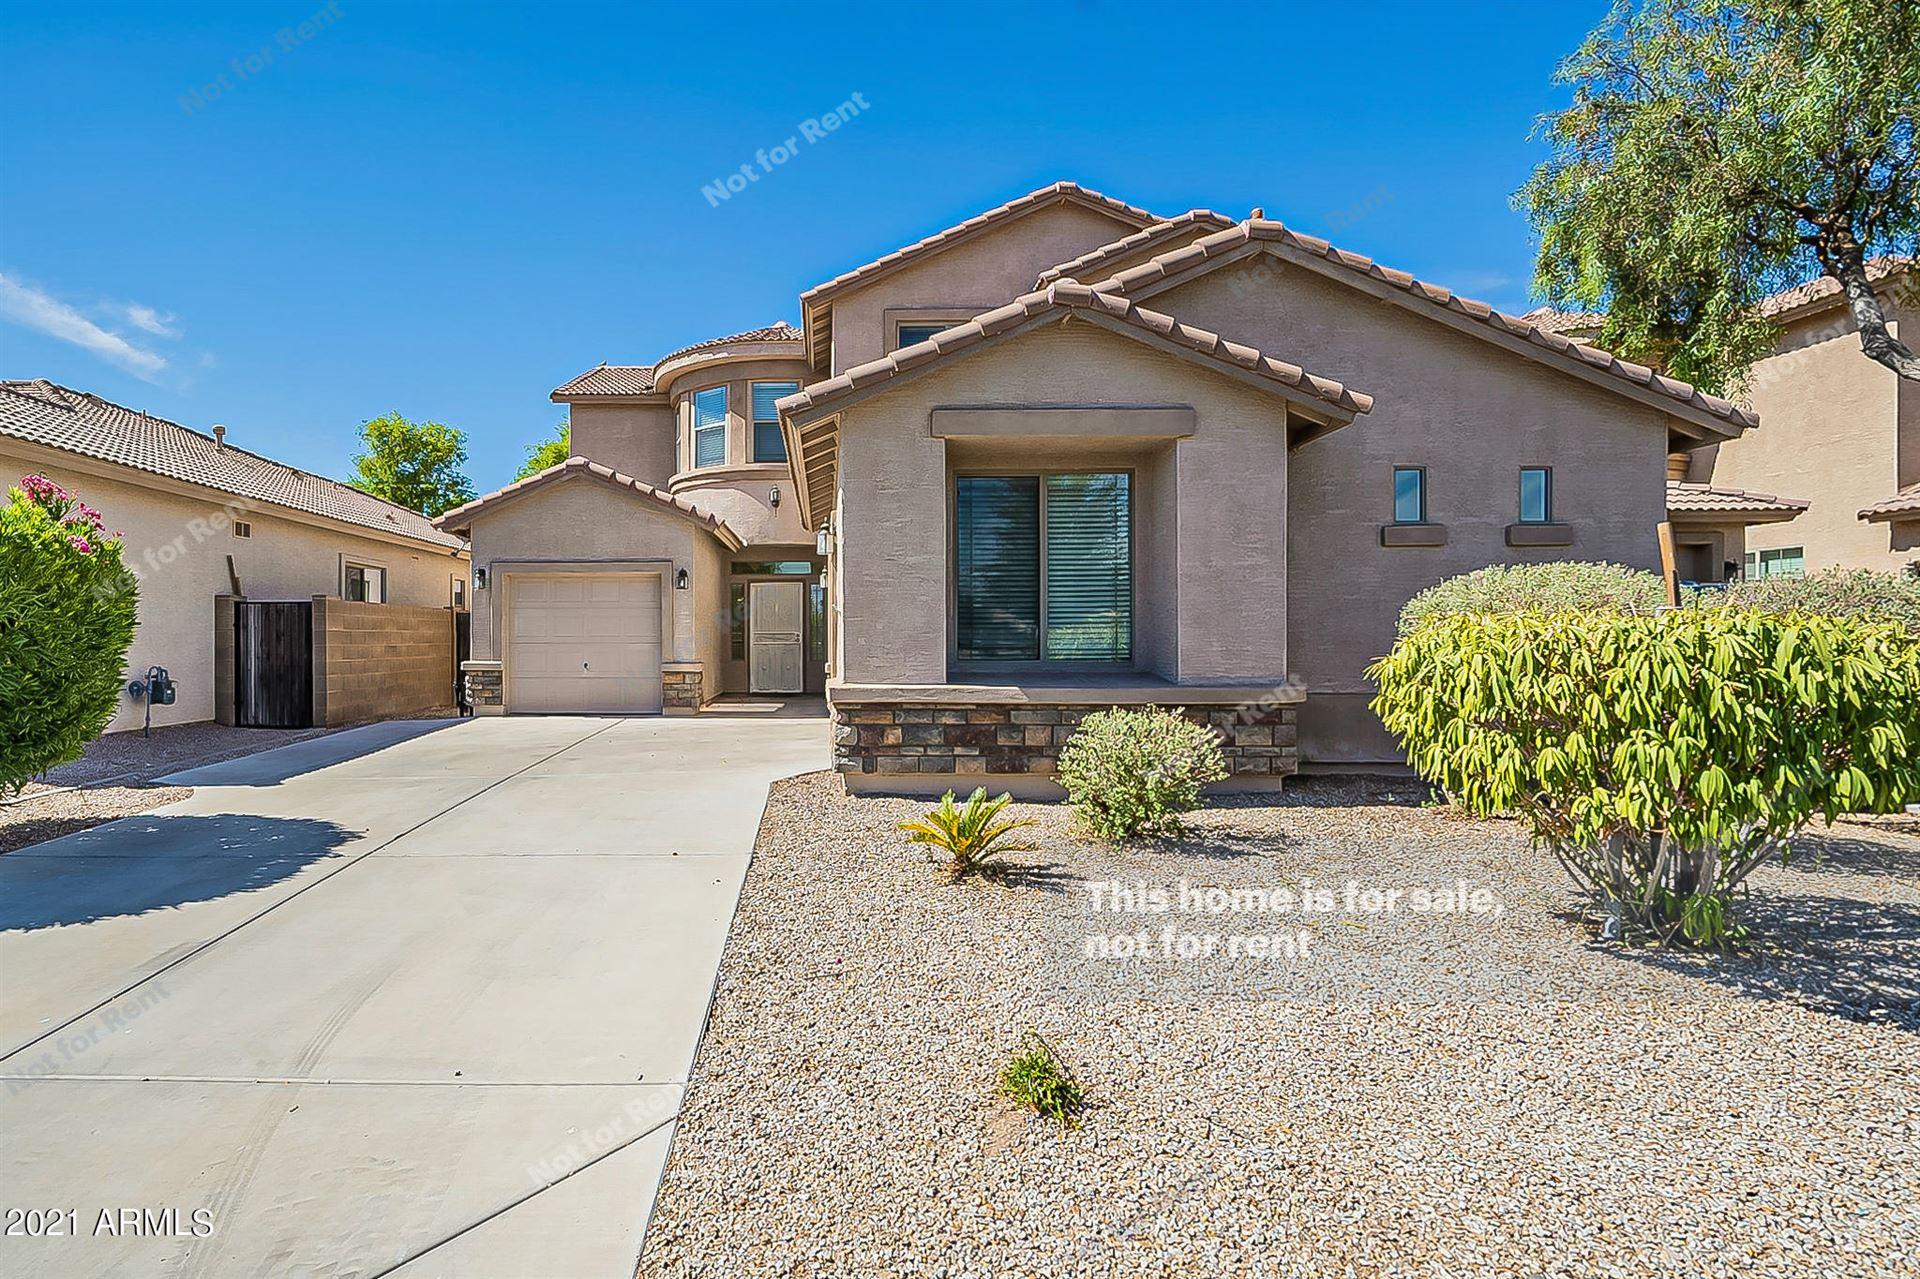 Photo of 43827 W ASKEW Drive, Maricopa, AZ 85138 (MLS # 6249392)